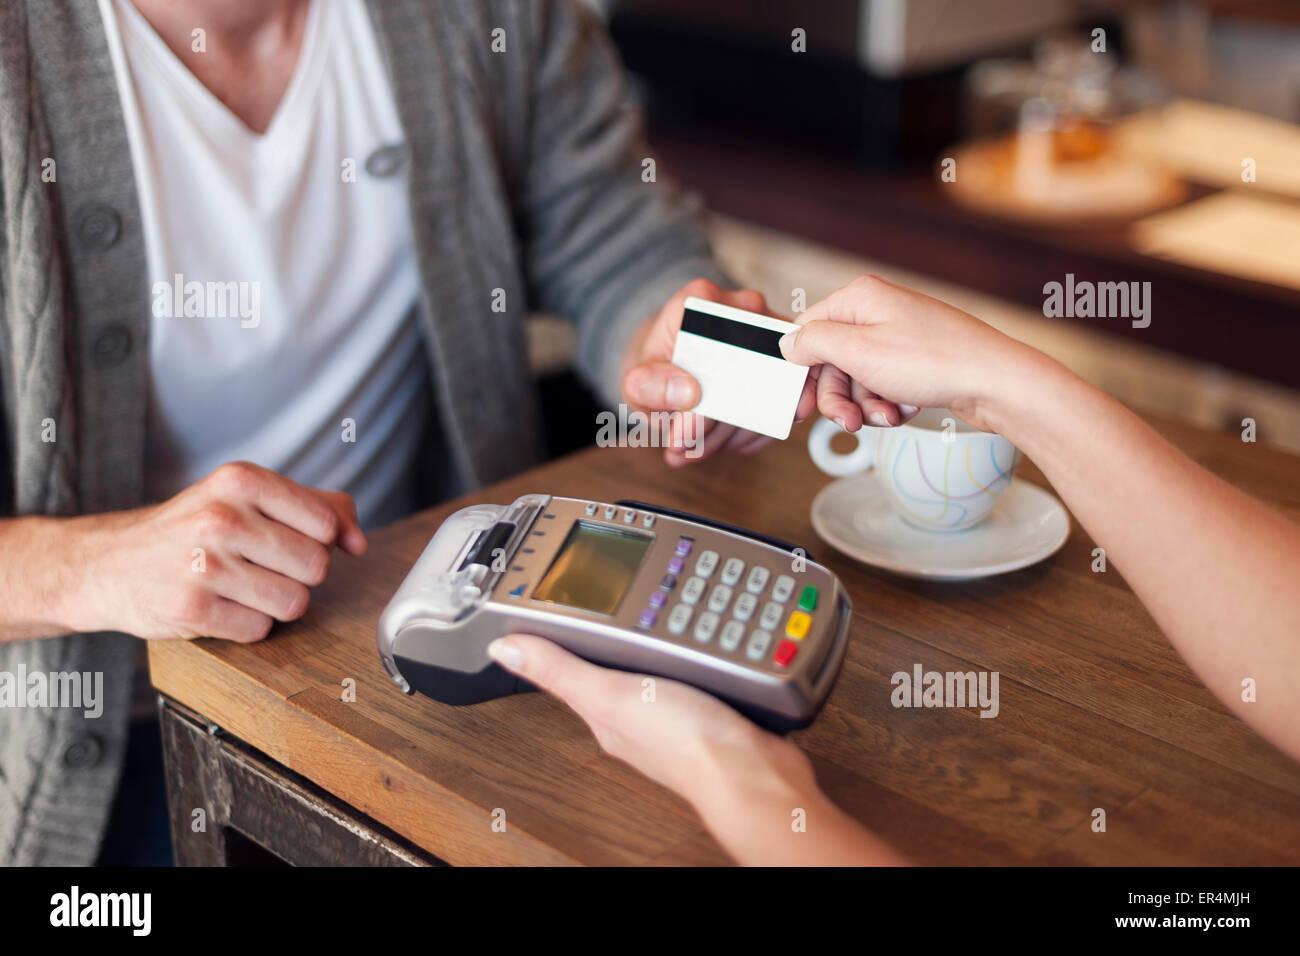 Nahaufnahme des Kunden per Kreditkarte zahlen. Krakau, Polen Stockbild